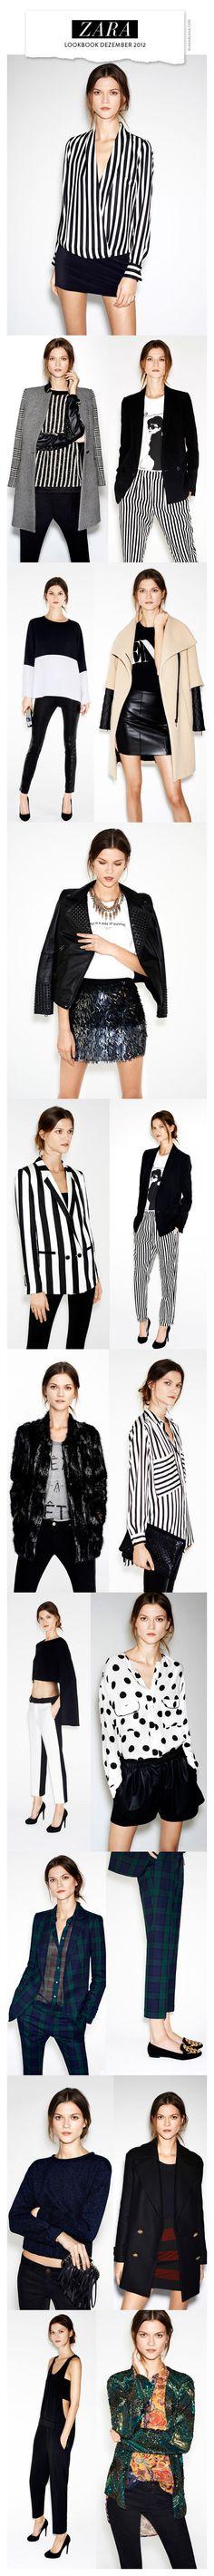 Zara Lookbook December 2012.